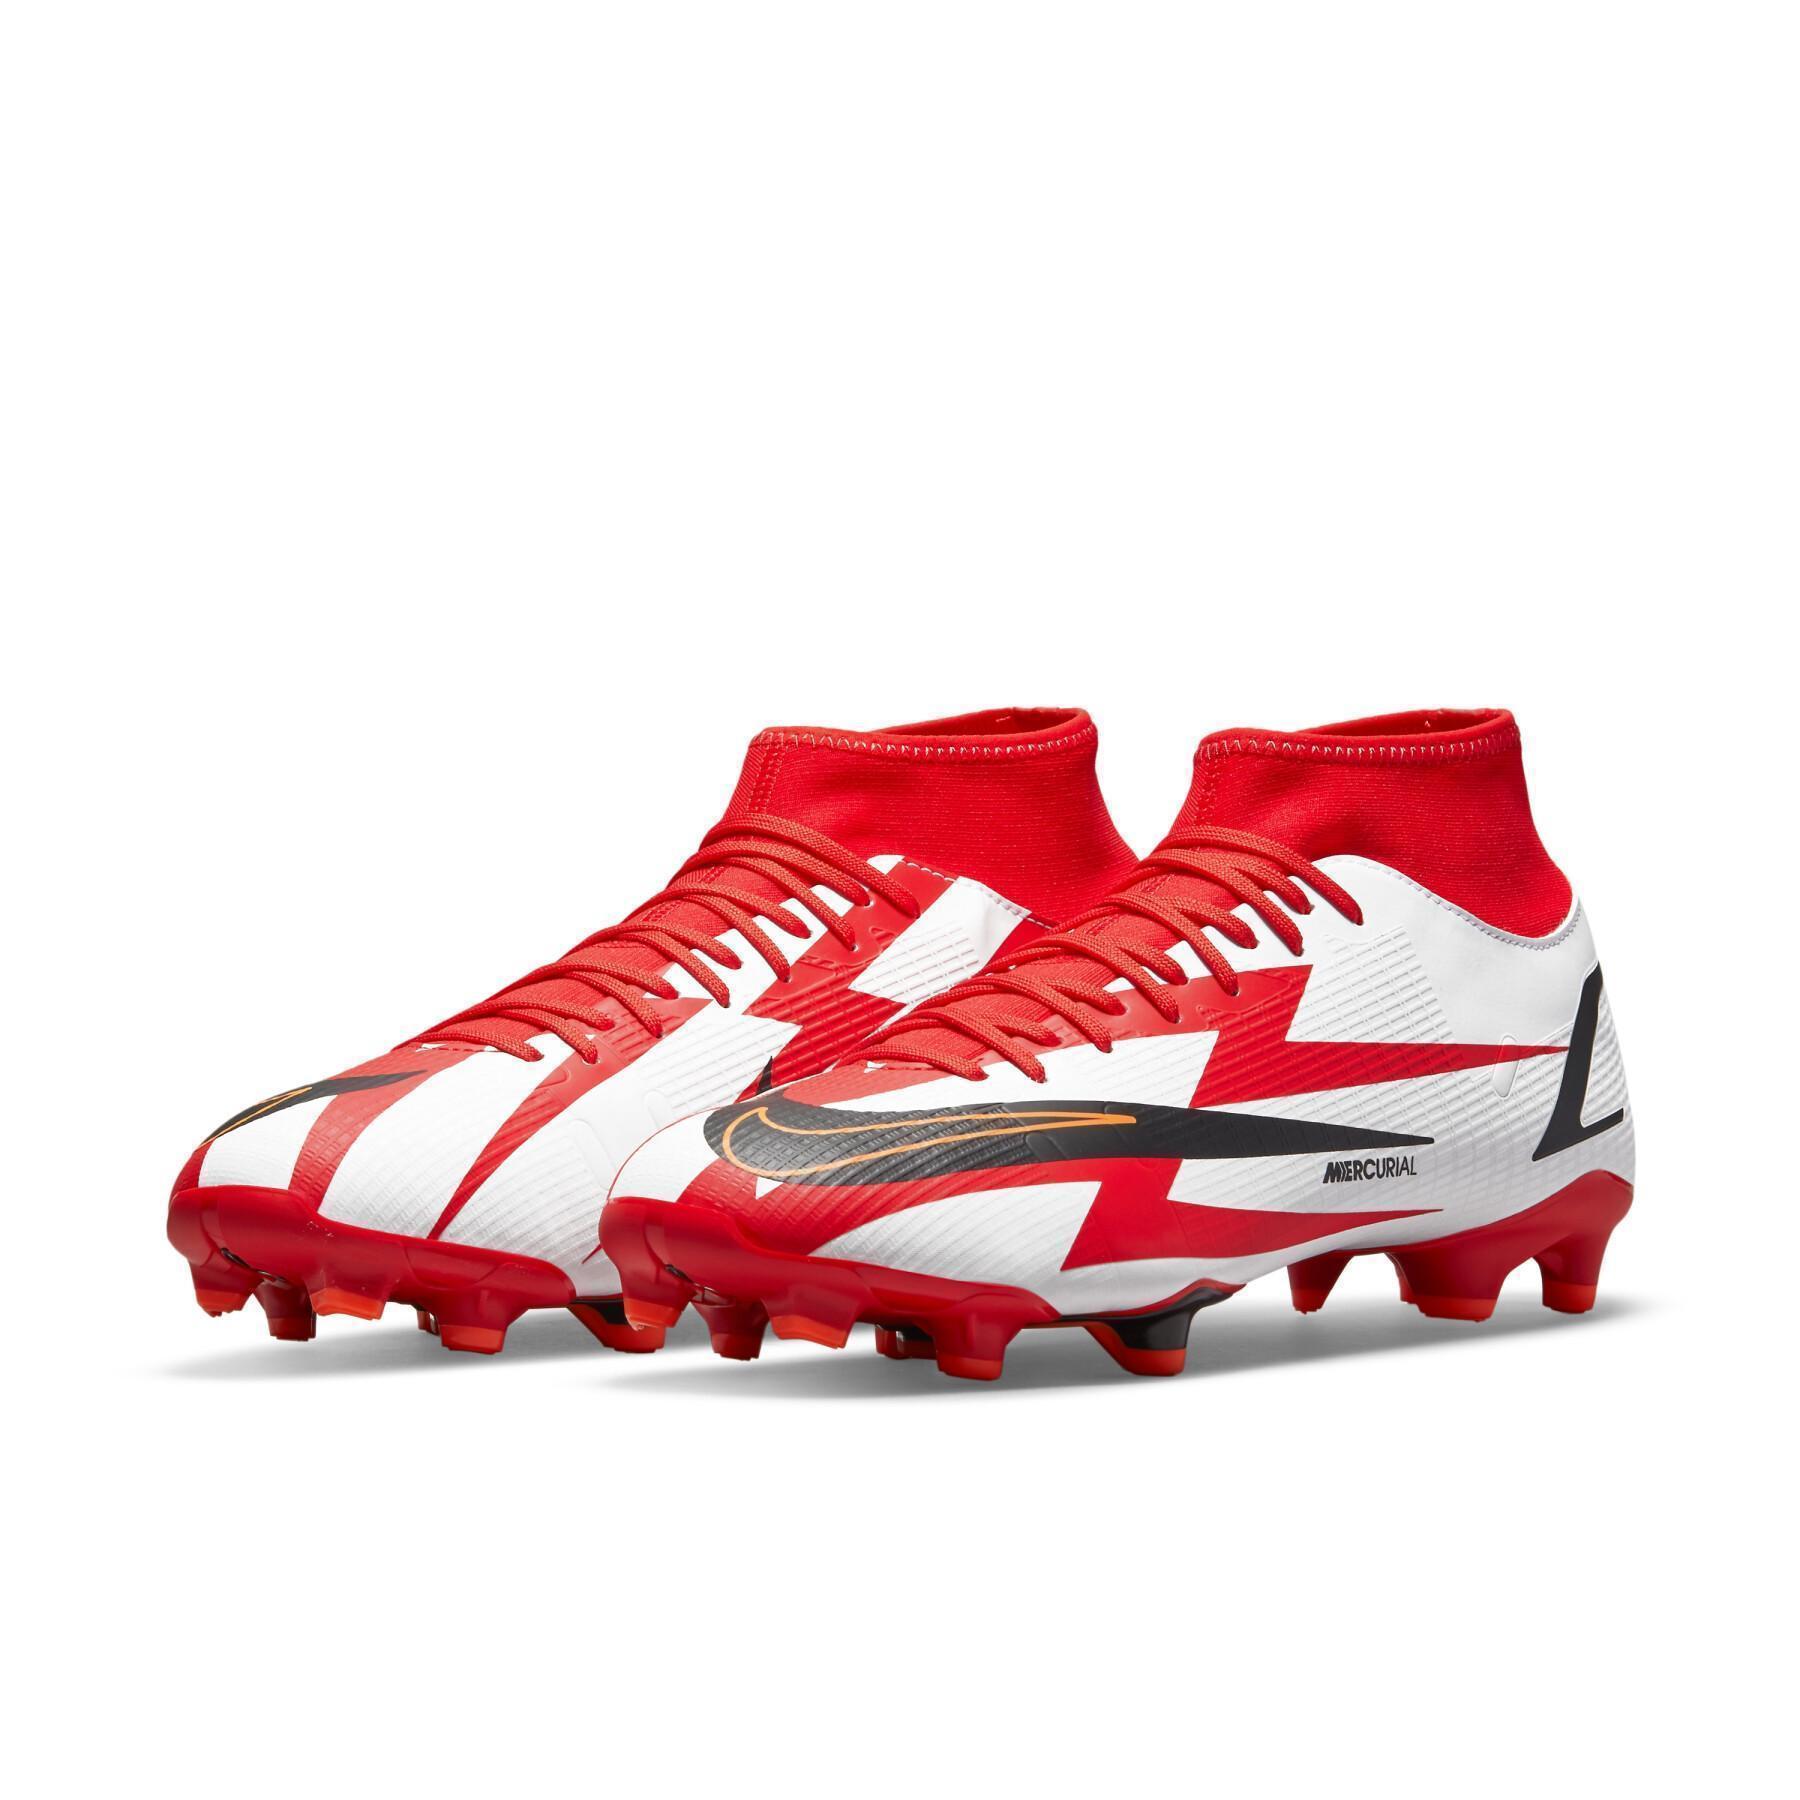 Schuhe Nike Mercurial Superfly 8 Academy CR7 MG